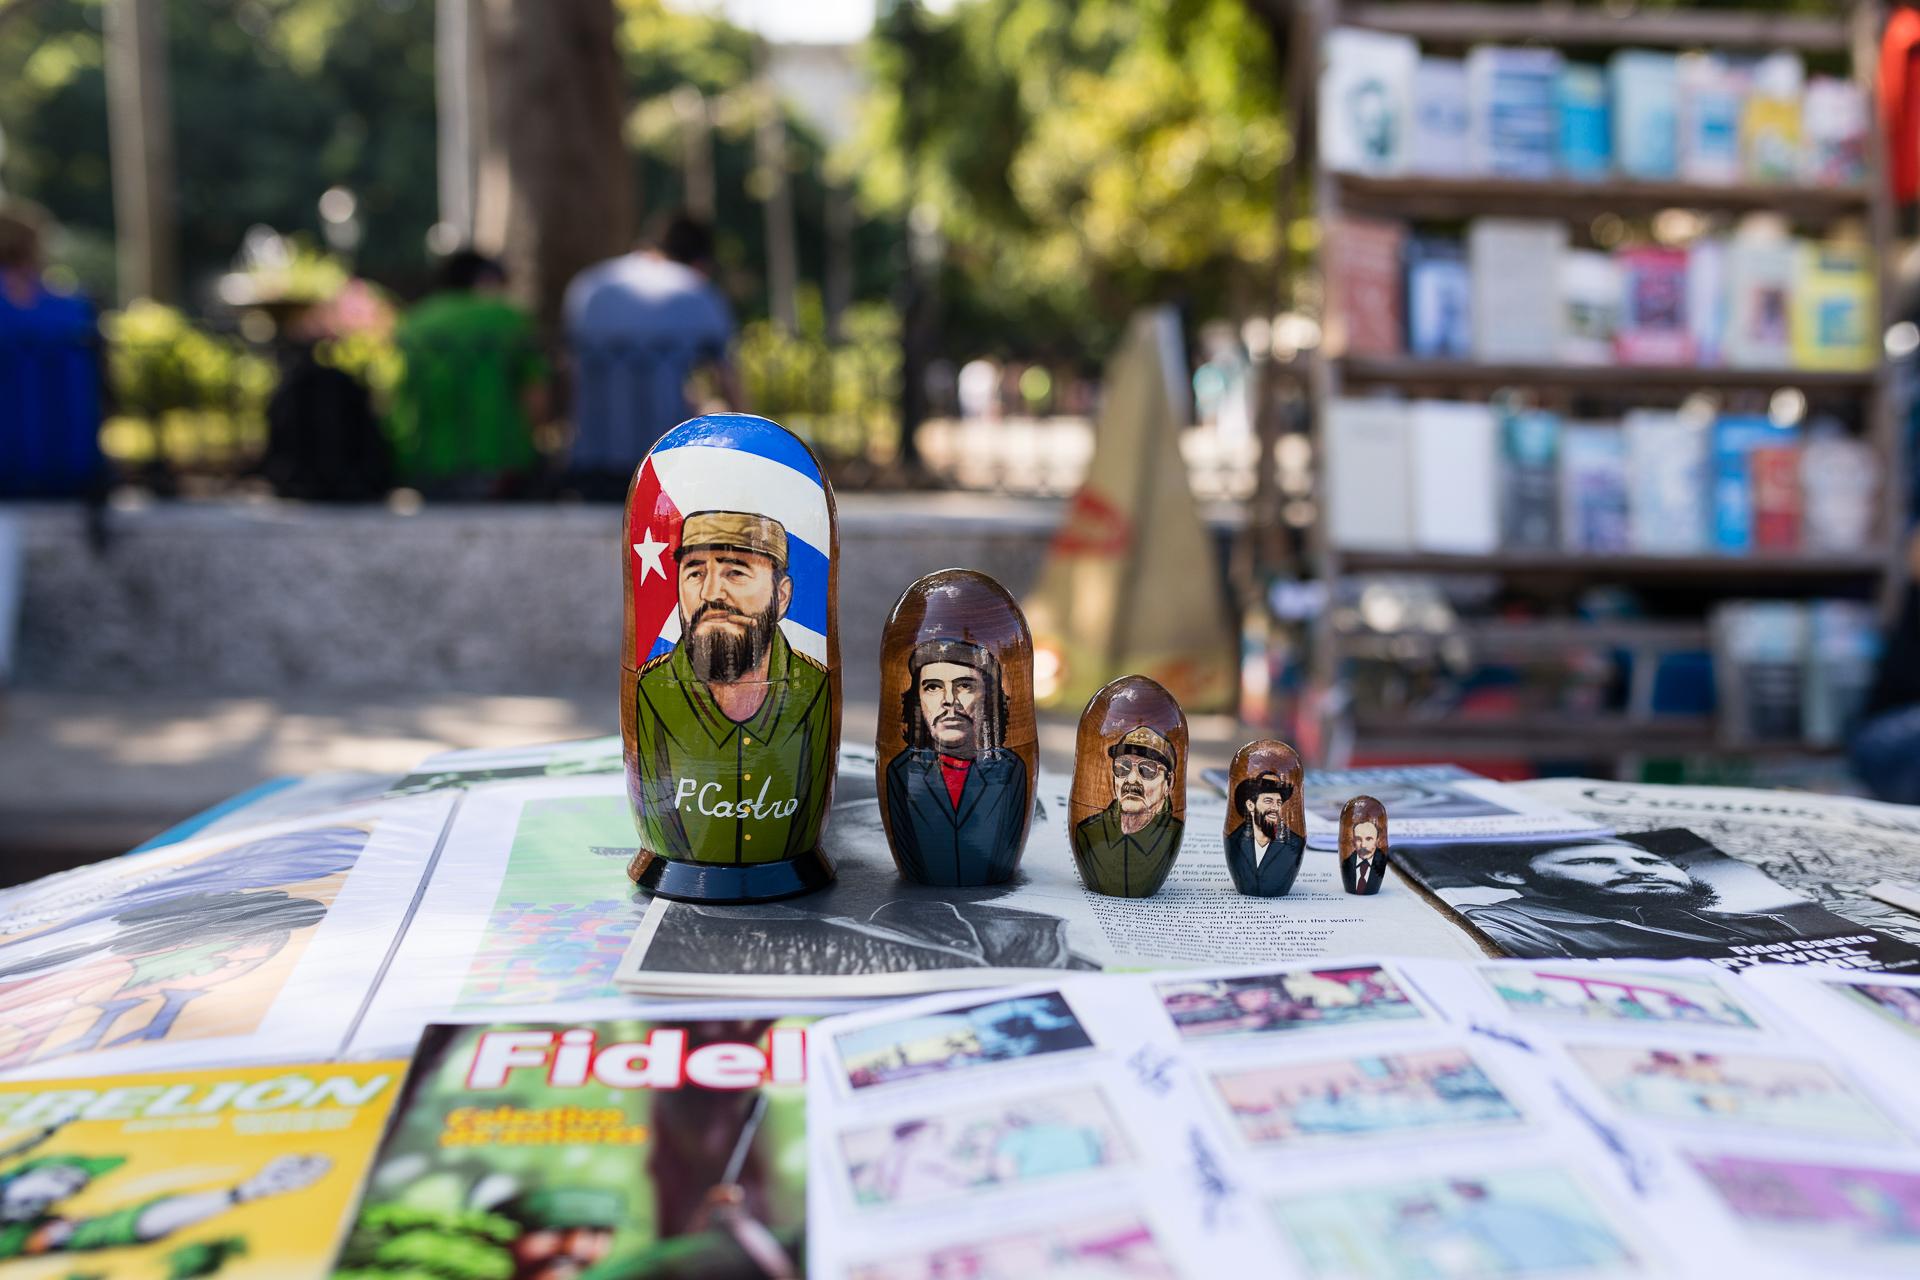 Bild: Flohmarkt auf dem Plaza de Armas in Kuba